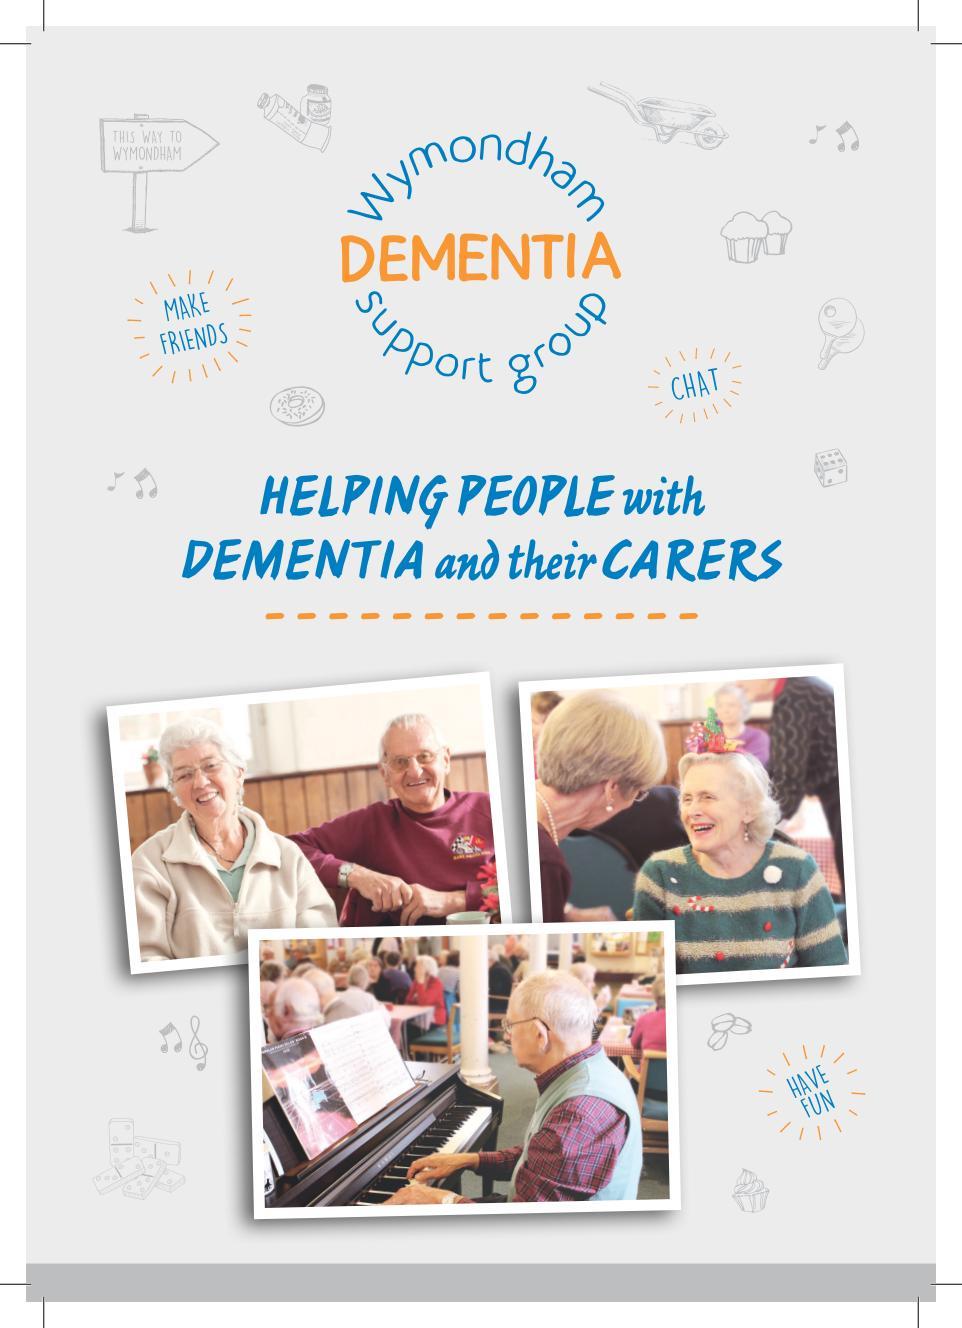 Wymondham Dementia Support Group Information Leaflet - Page 1